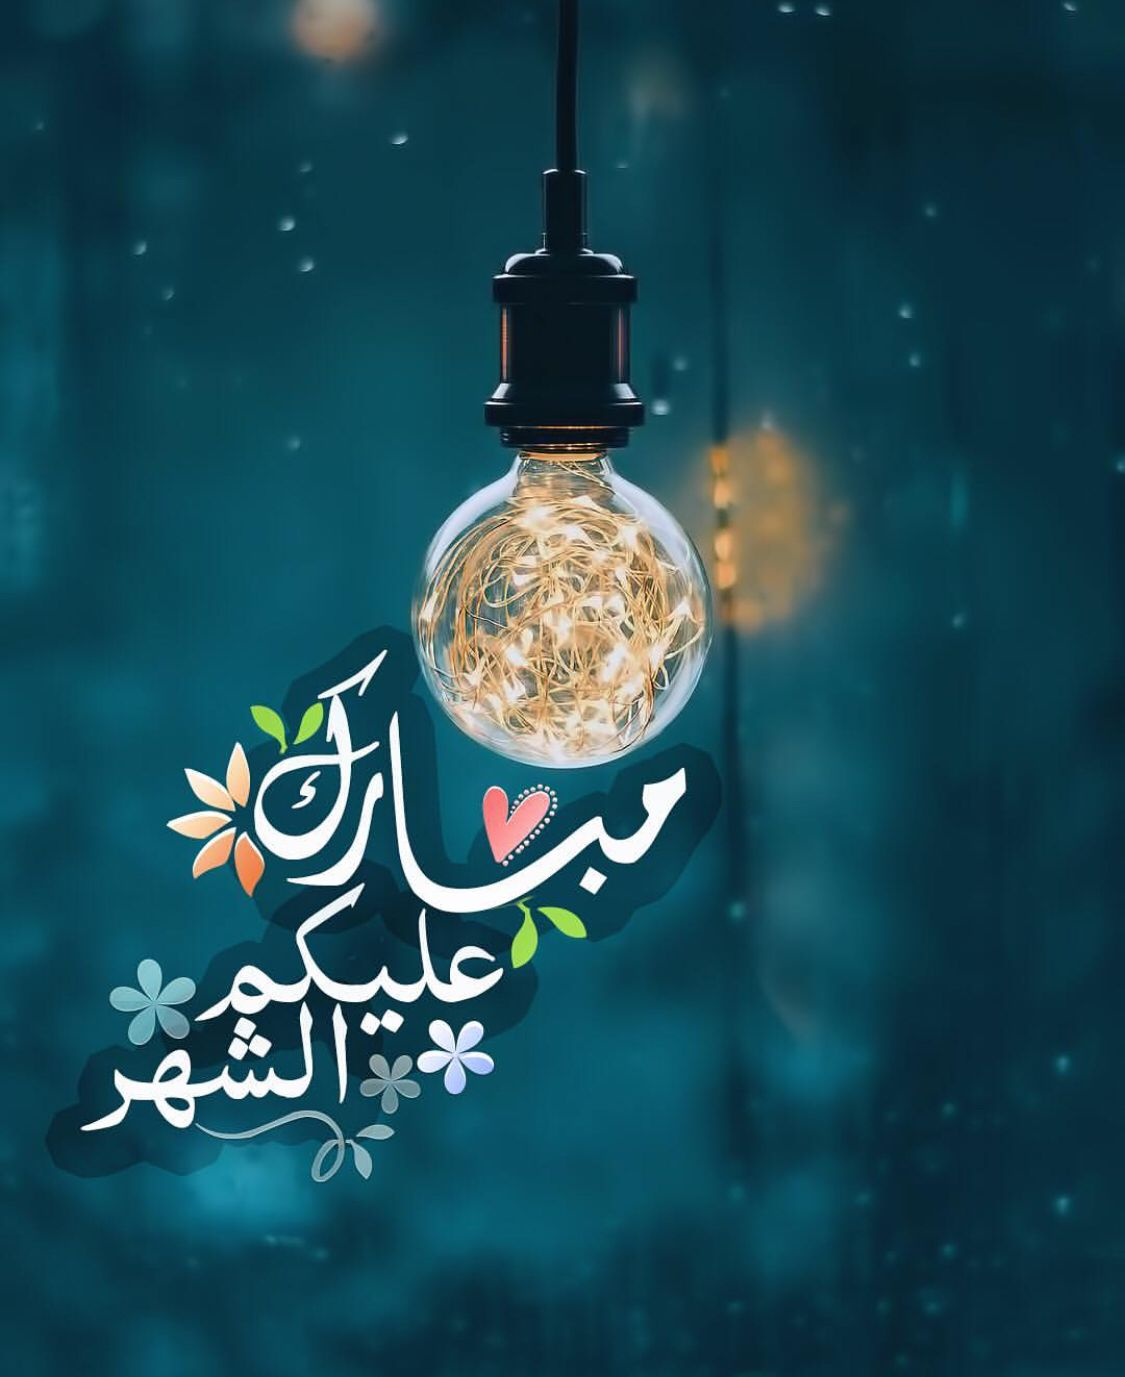 Pin By محمد حسين الدخاني On رمضان كريم Ramadan Kareem Christmas Ornaments Holiday Decor Ramadan